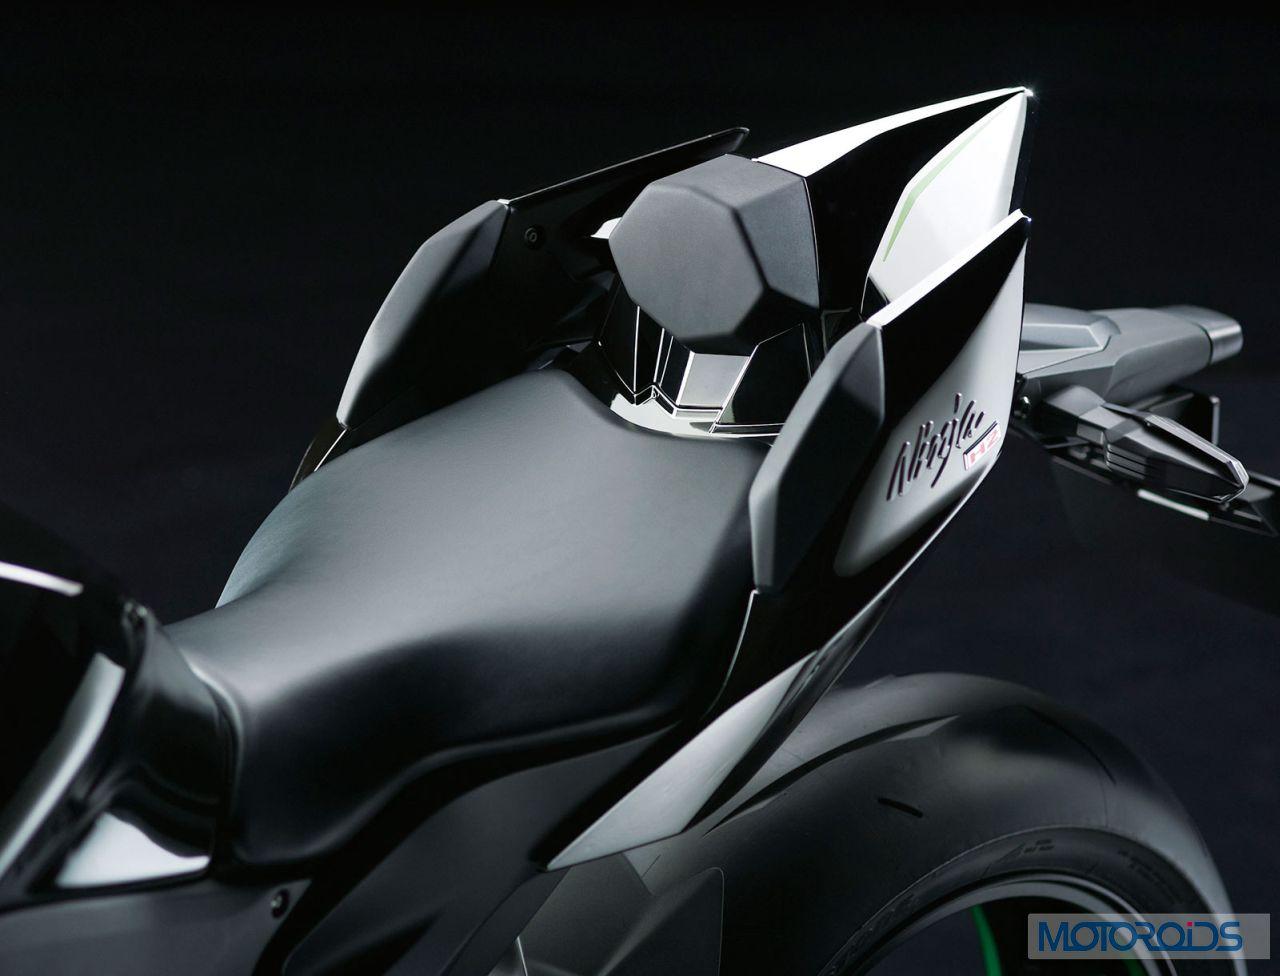 Kawasaki-Ninja-H2-Official-Image-29-Seat